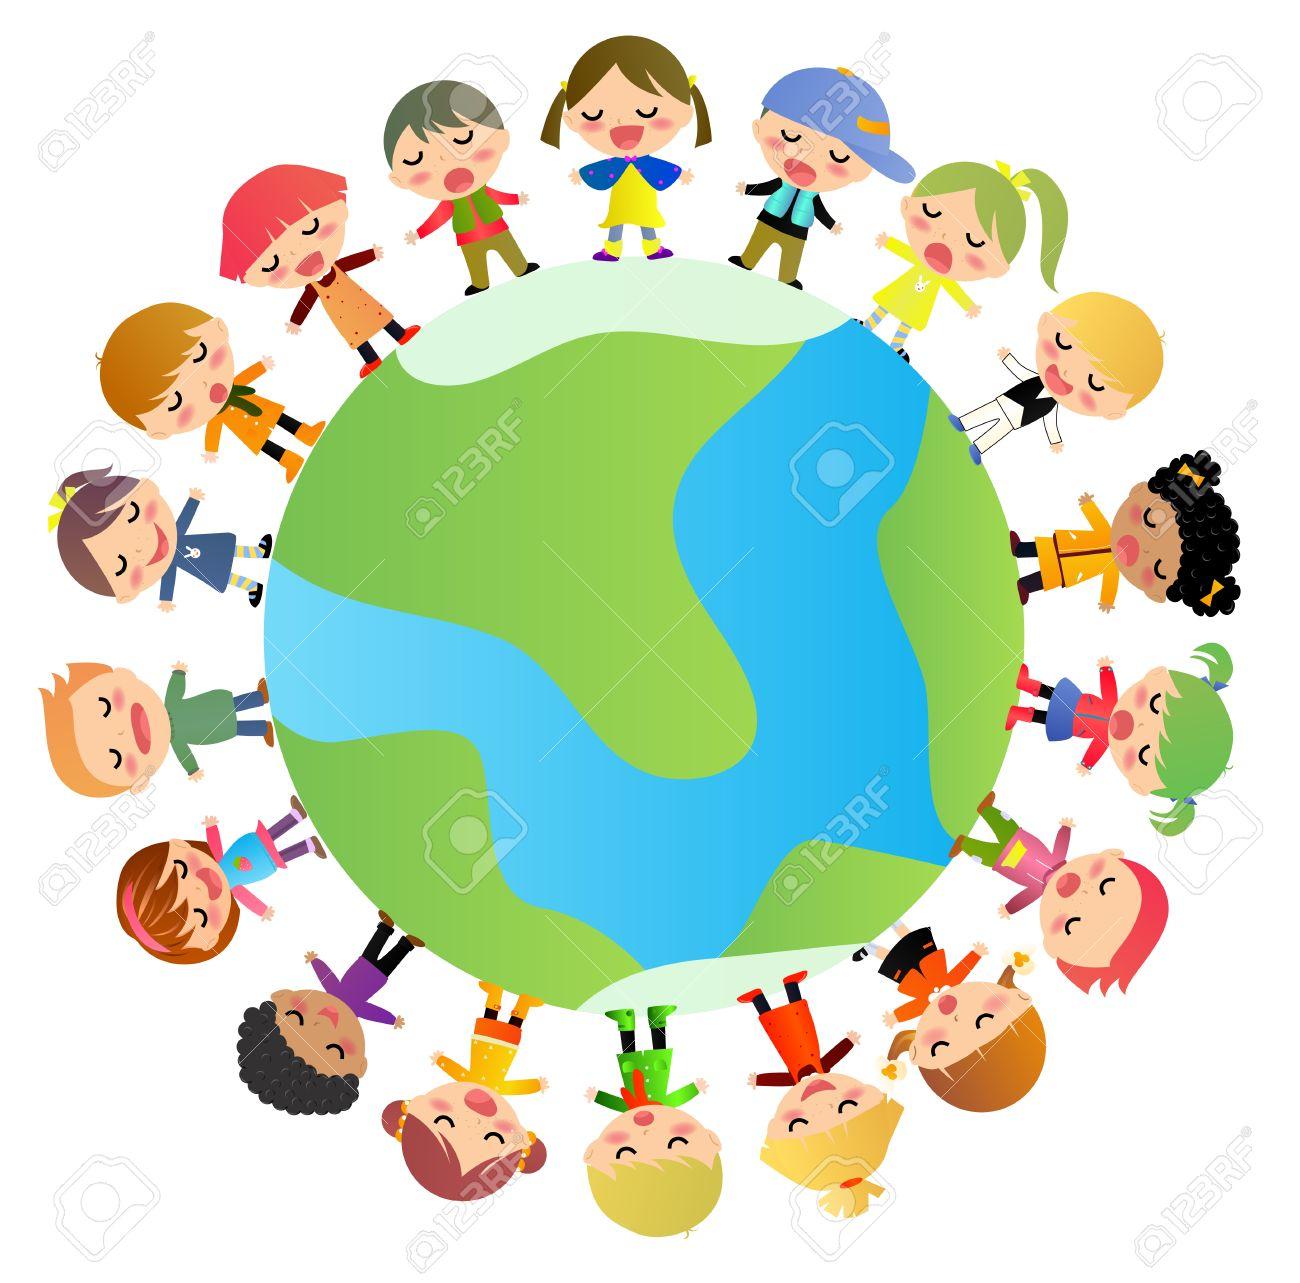 kids diversity holding hands around the world.